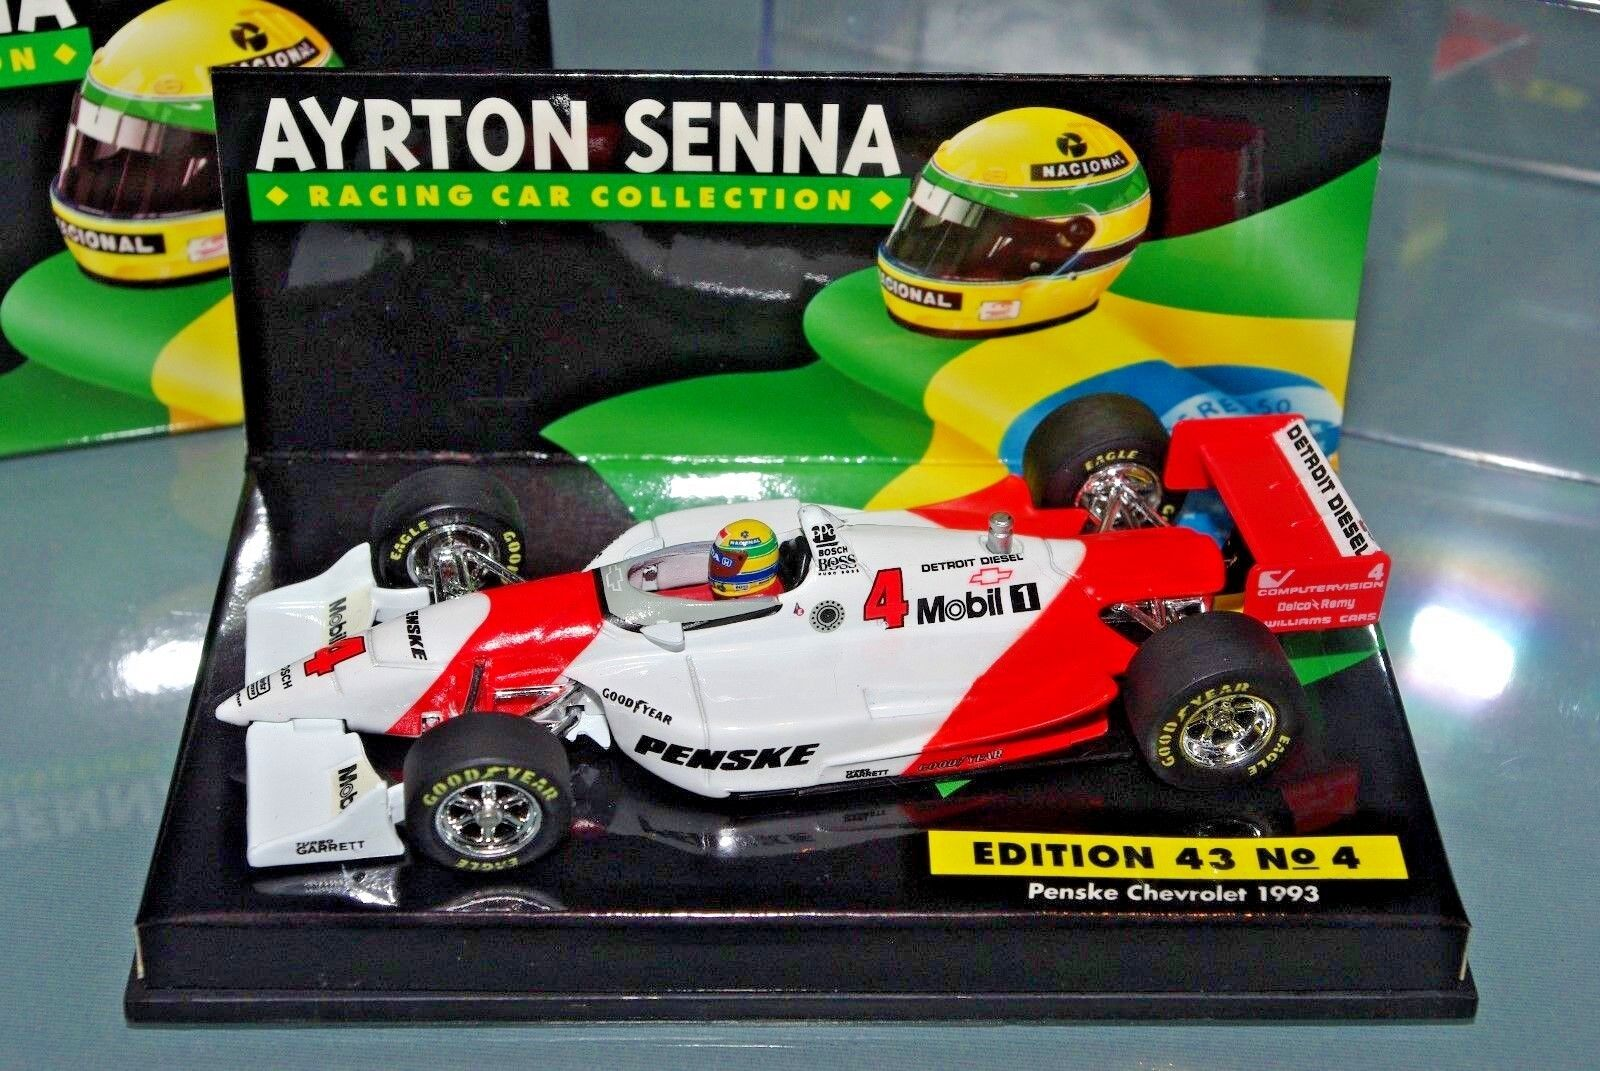 Minichamps Indy 1 43 Penske Chevrolet 1993-Ayrton Senna Colección